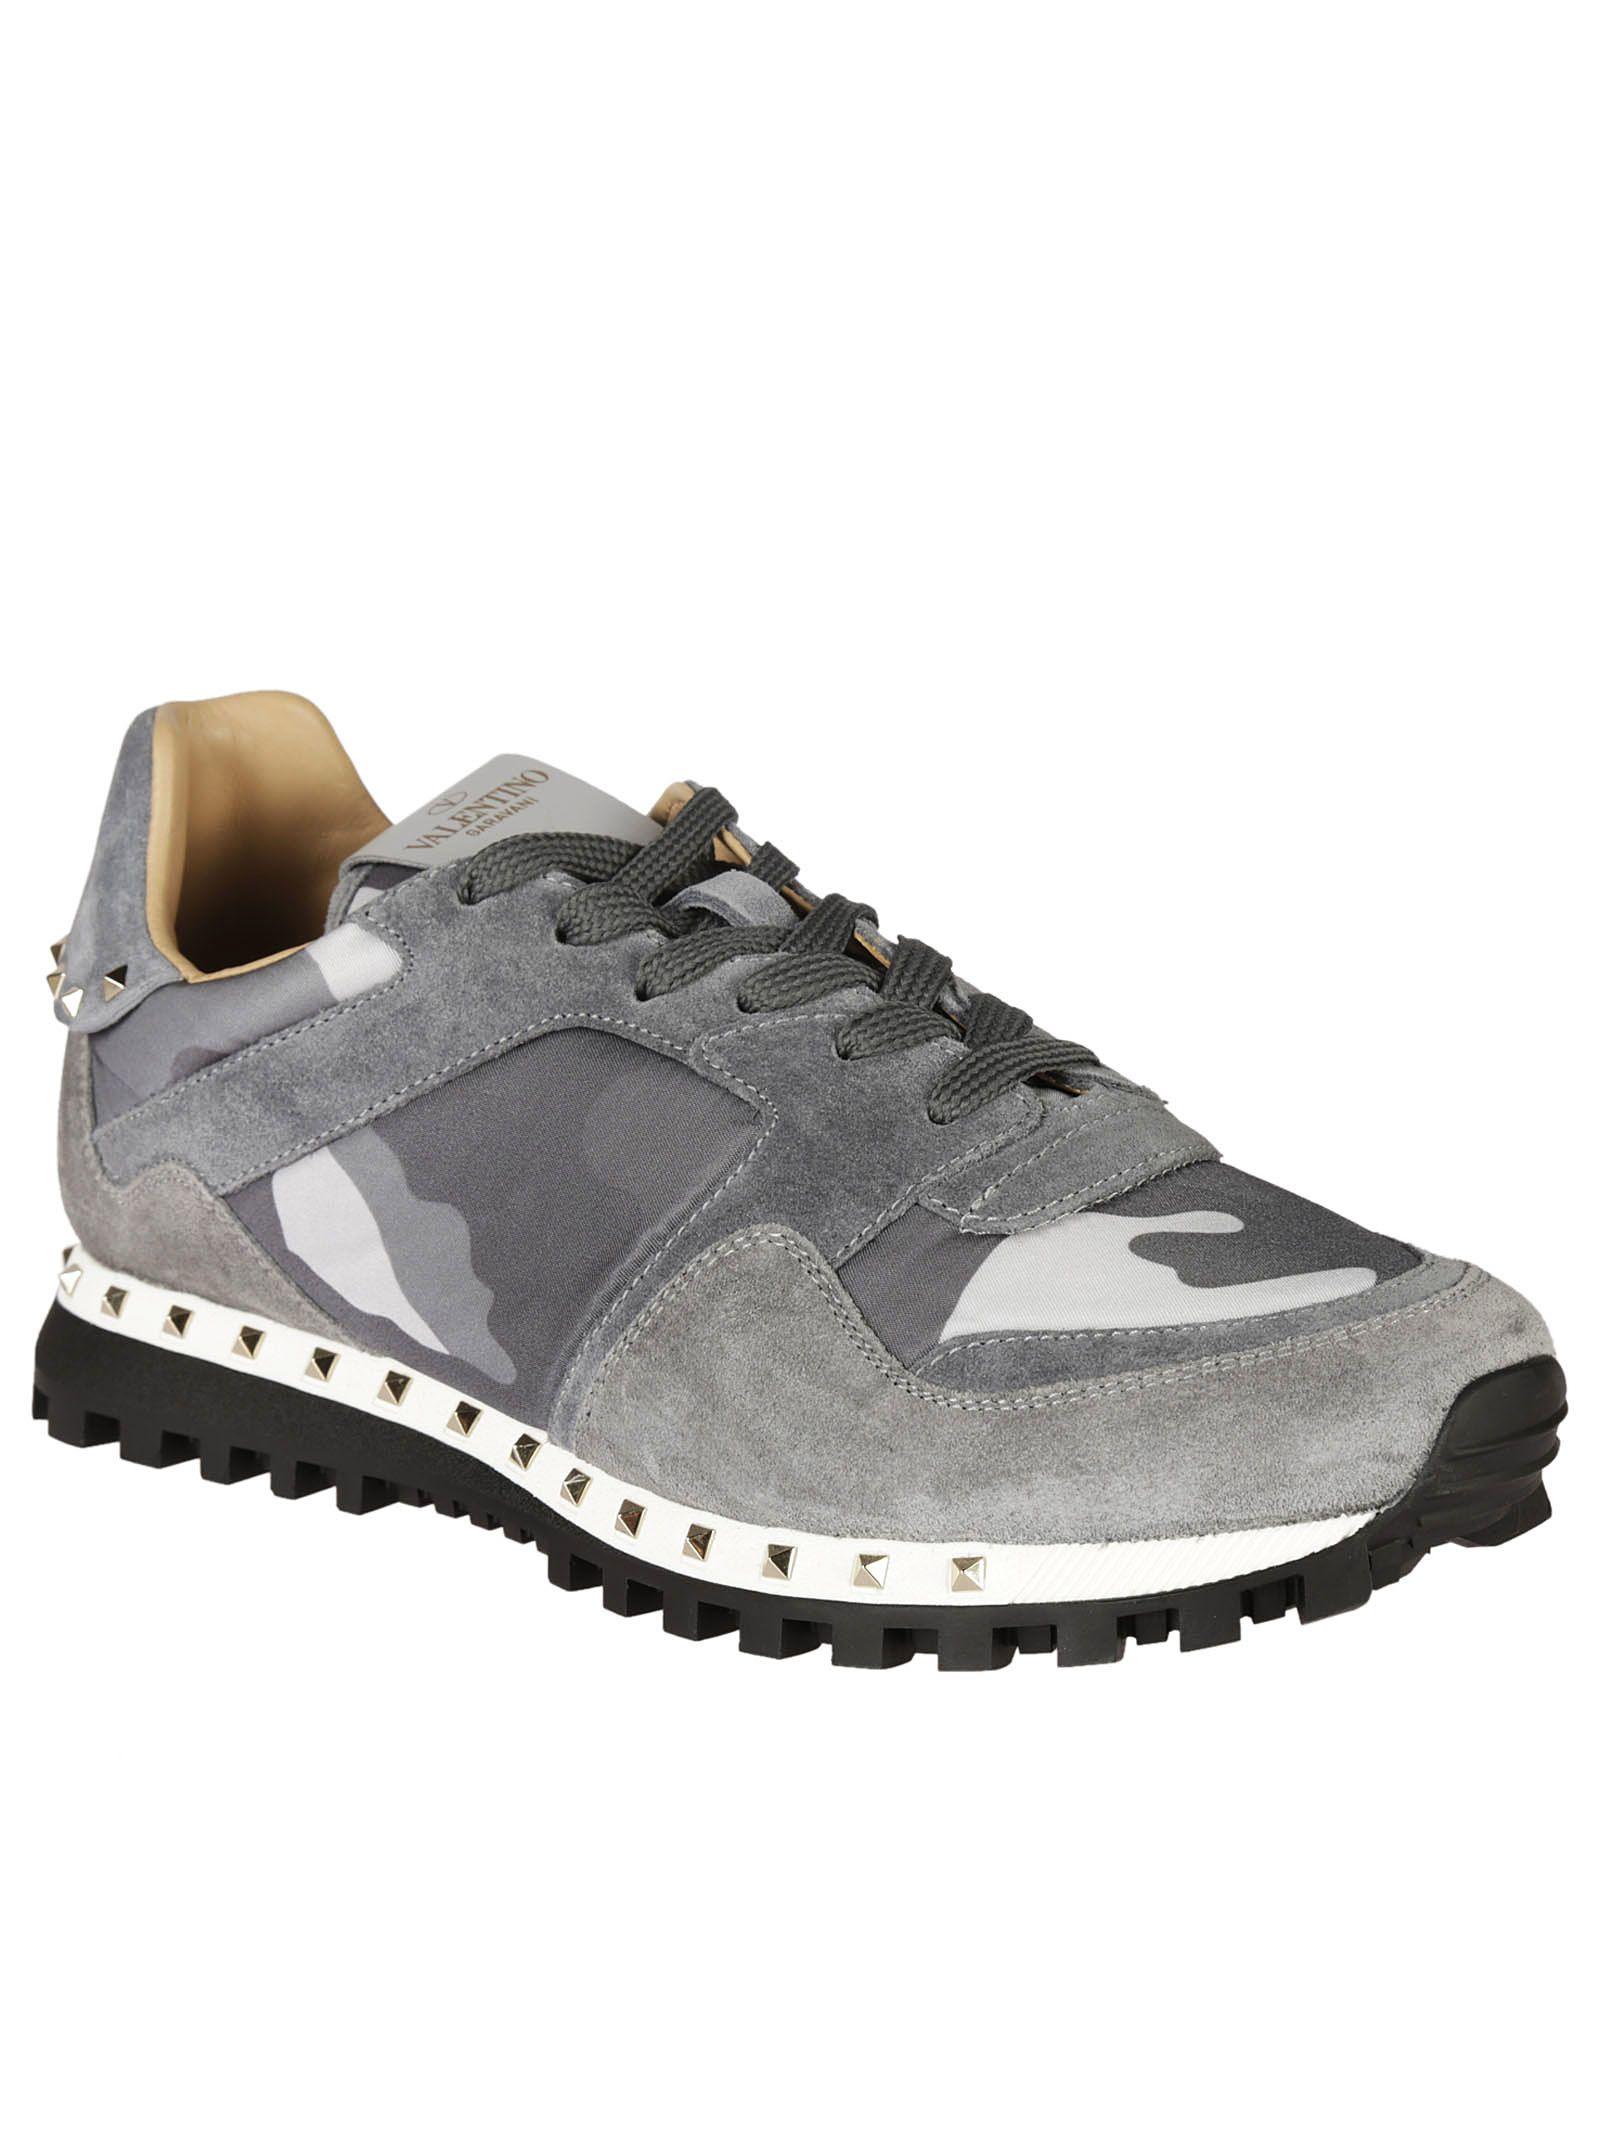 Valentino Garavani Valentino Garavani Rockstud Camouflage Sneakers - Gray - 6622247 | italist